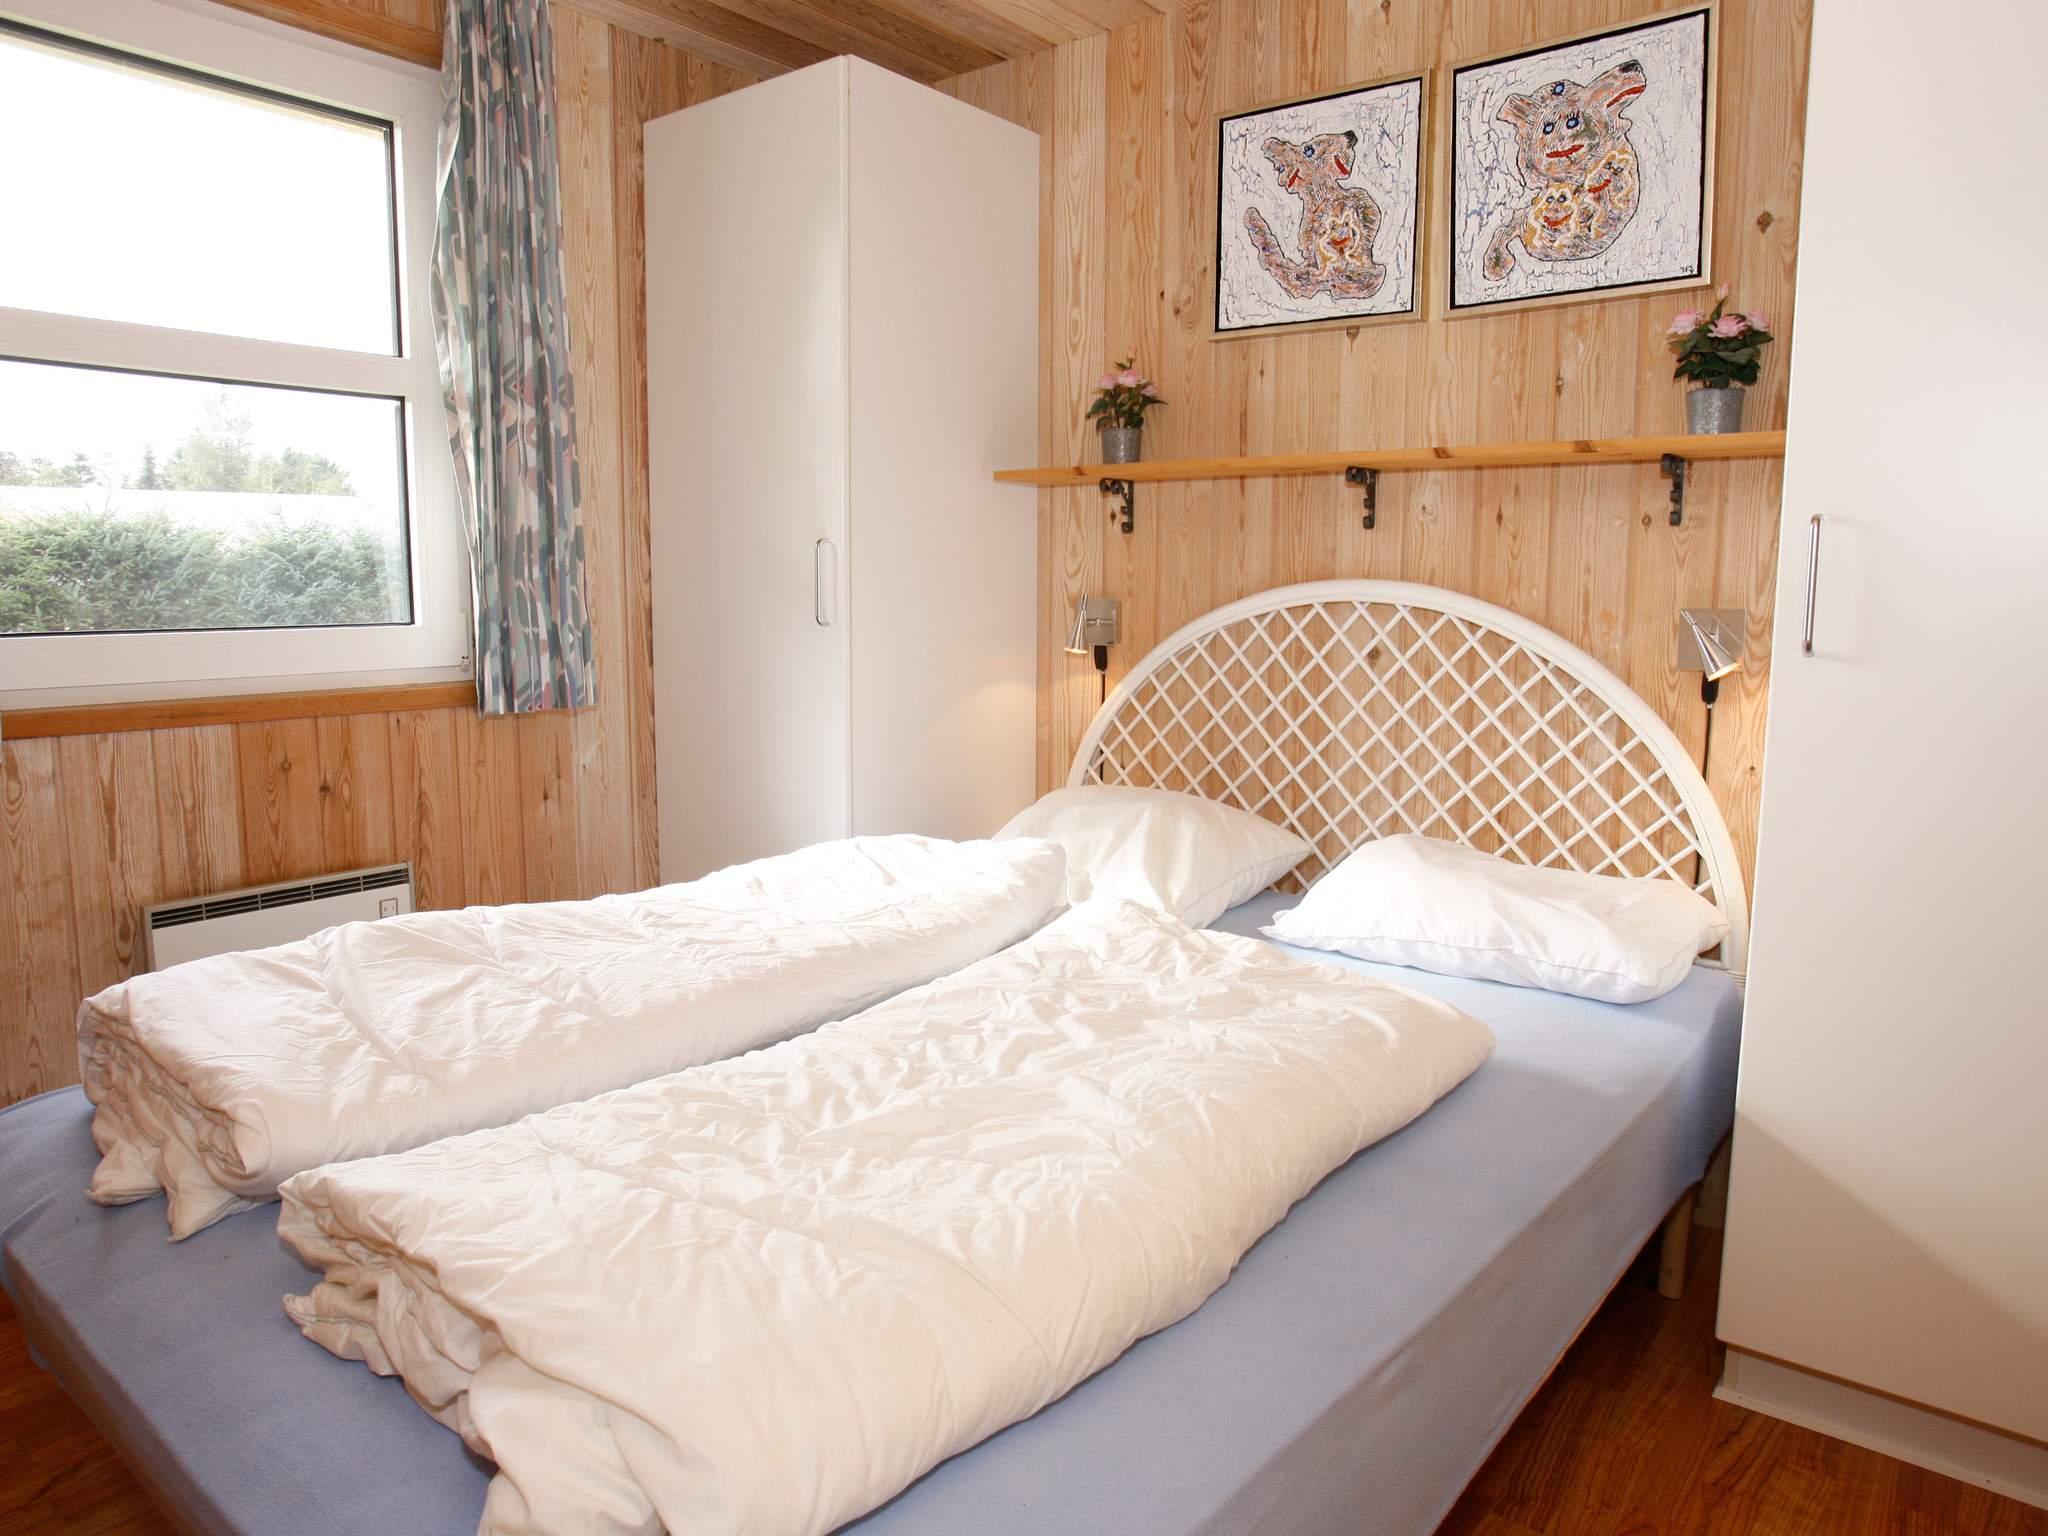 Ferienhaus Øster Hurup (89296), Øster Hurup, , Dänische Ostsee, Dänemark, Bild 10